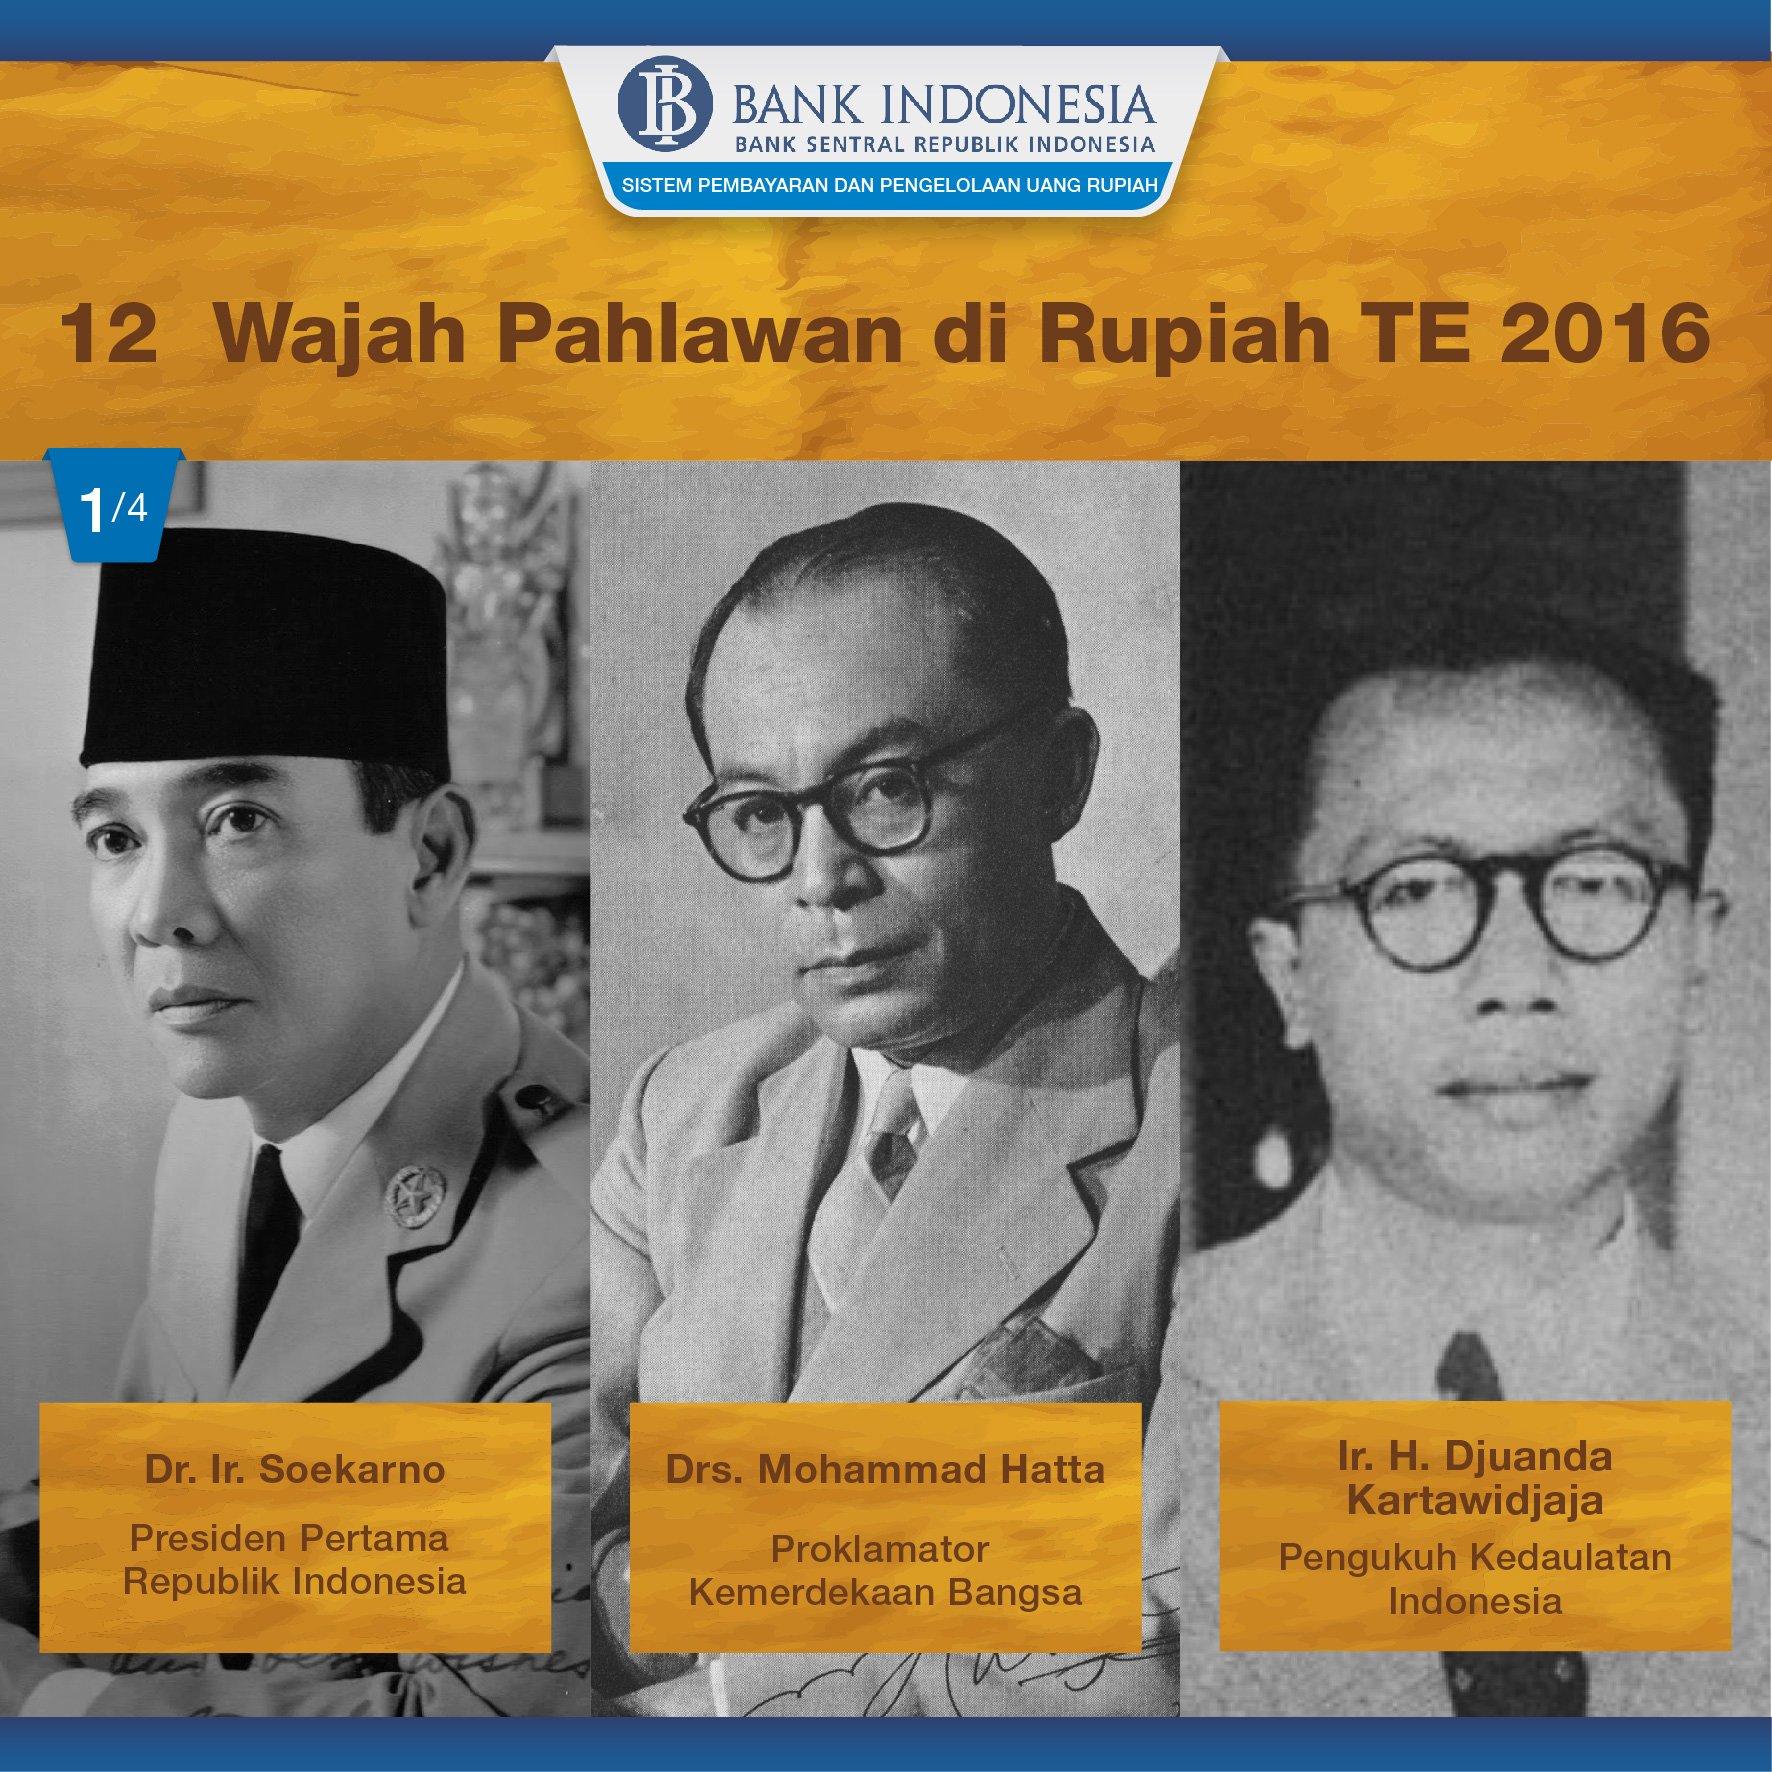 Soekarno dan Mohammad Hatta pada pecahan Rp.100.000 kertas, Djuanda Kartawidjaja pada Rp50.000 kertas #RupiahNKR https://t.co/Th54EDP7MD